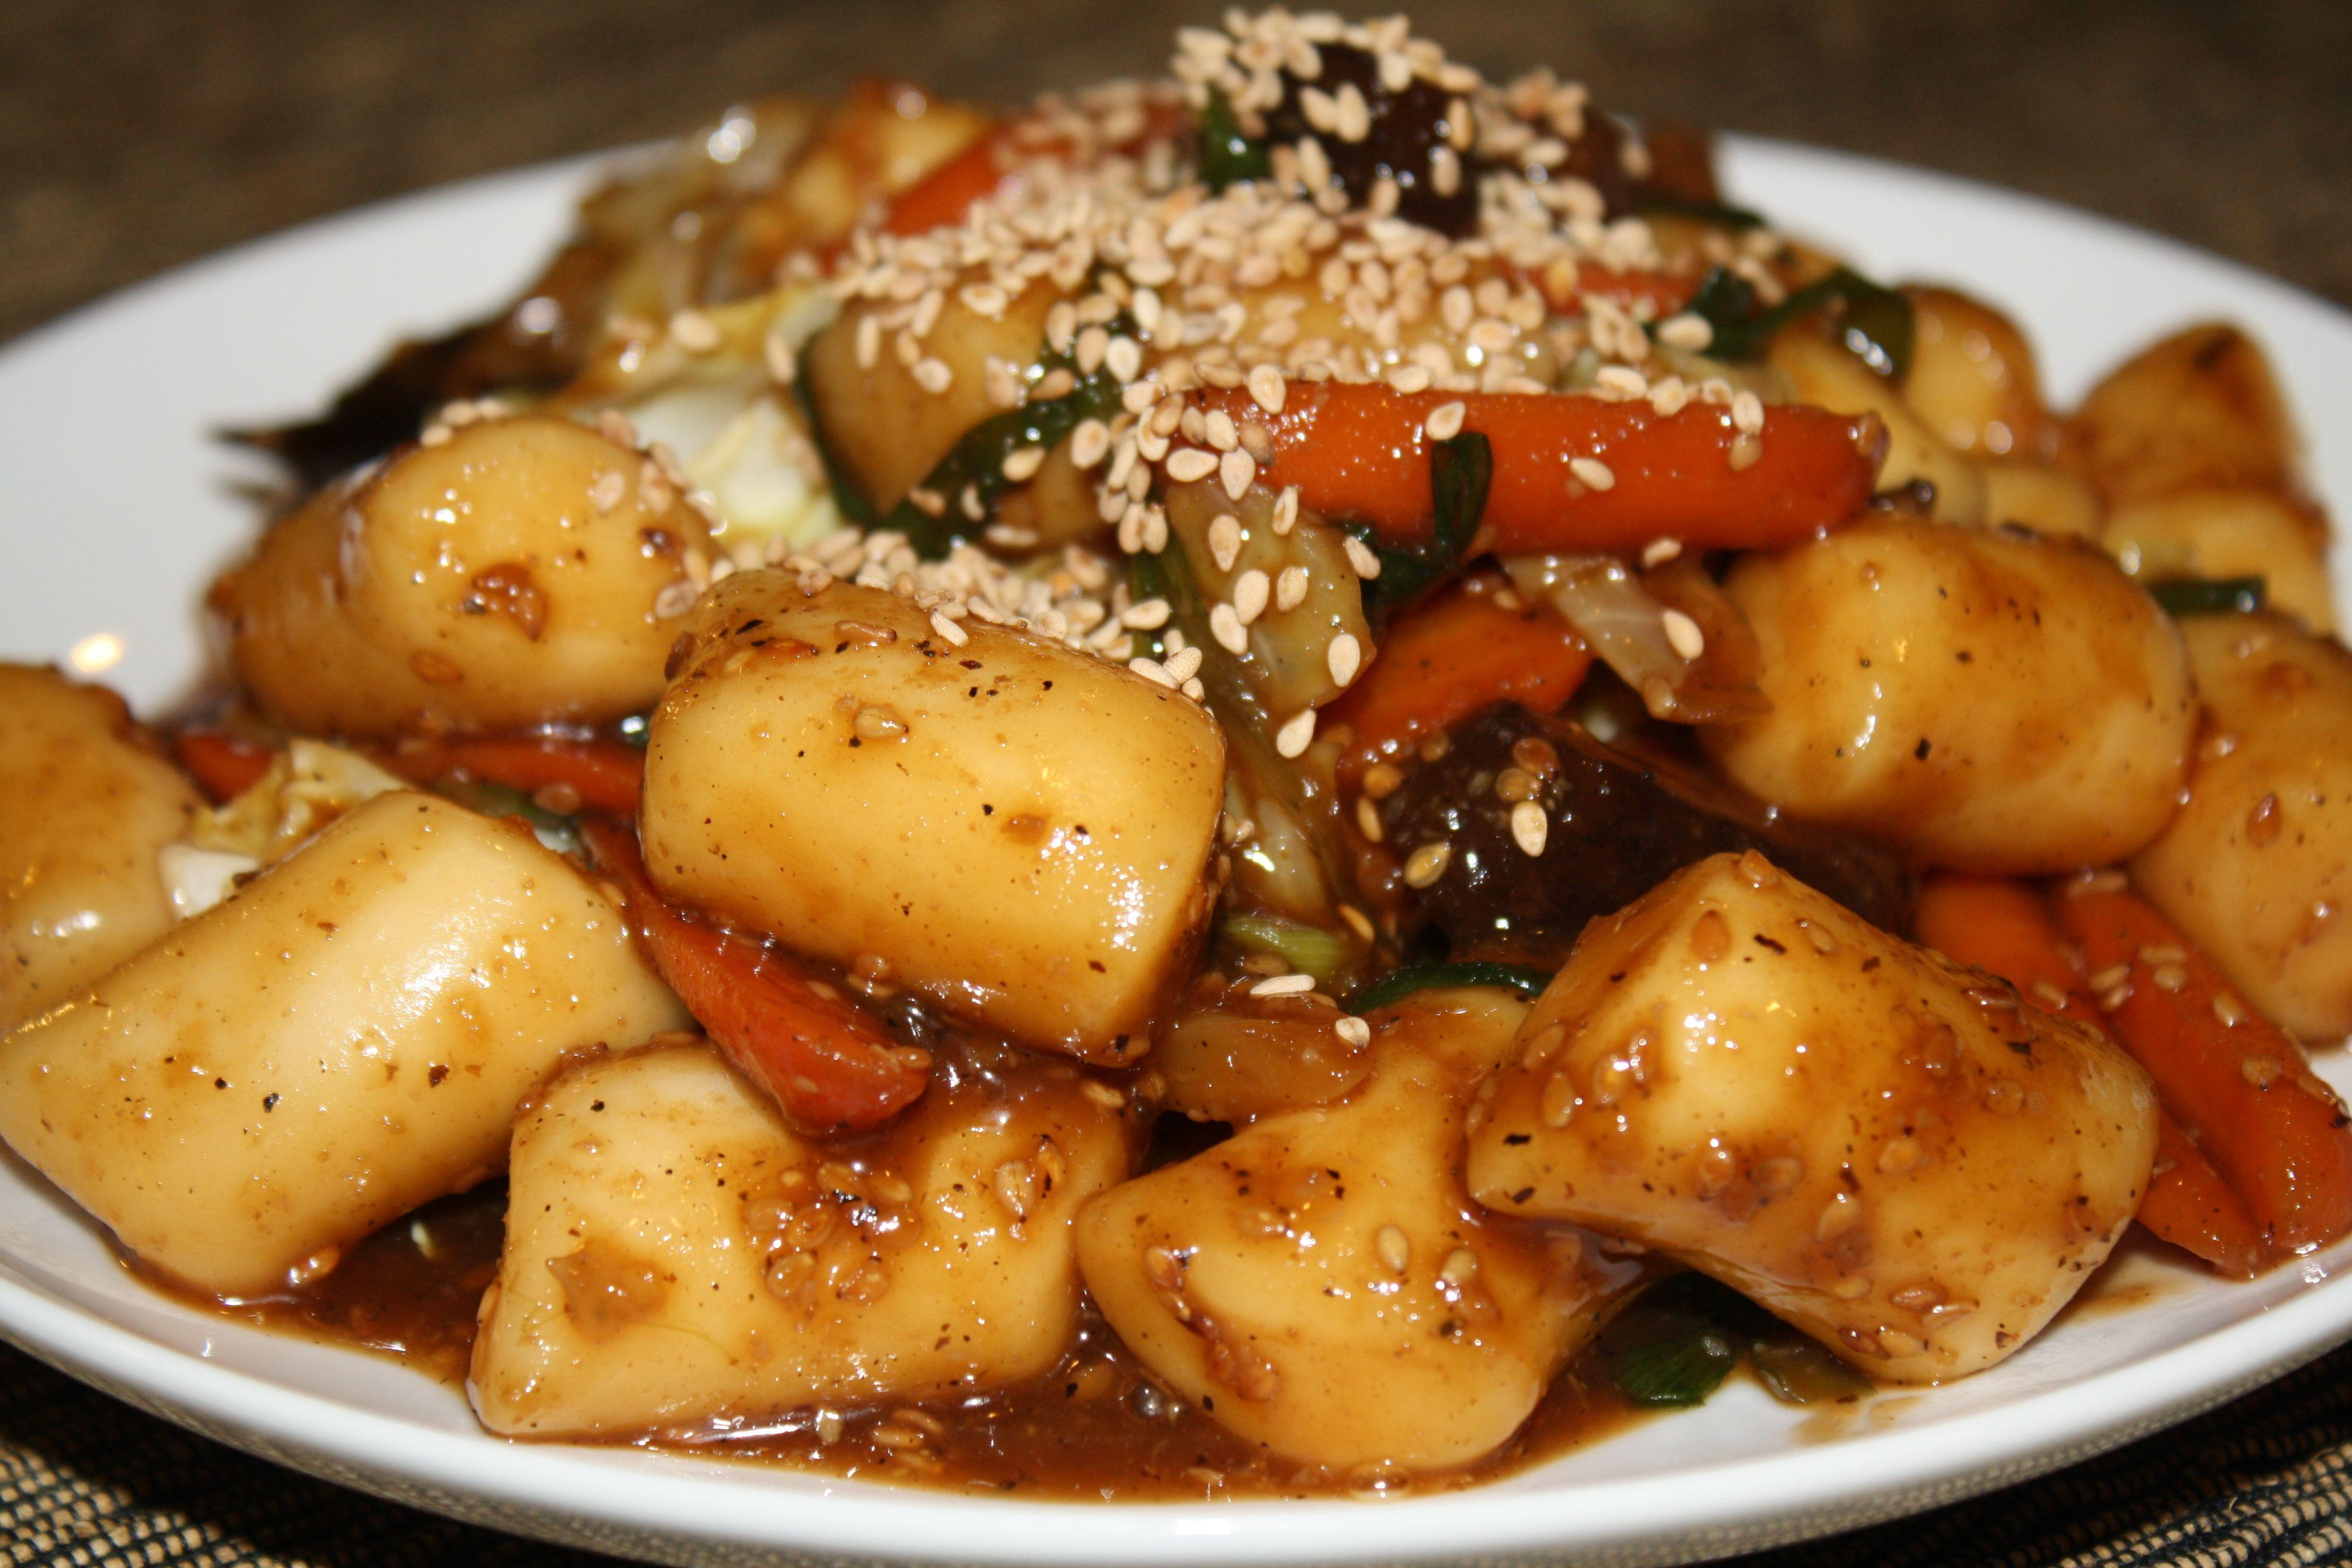 Vegan goongjung ddeokbokki palace ddeokbokki soy sauce rice cake palace ddeokbokki vegan korean foodkorean food recipesvegan forumfinder Image collections